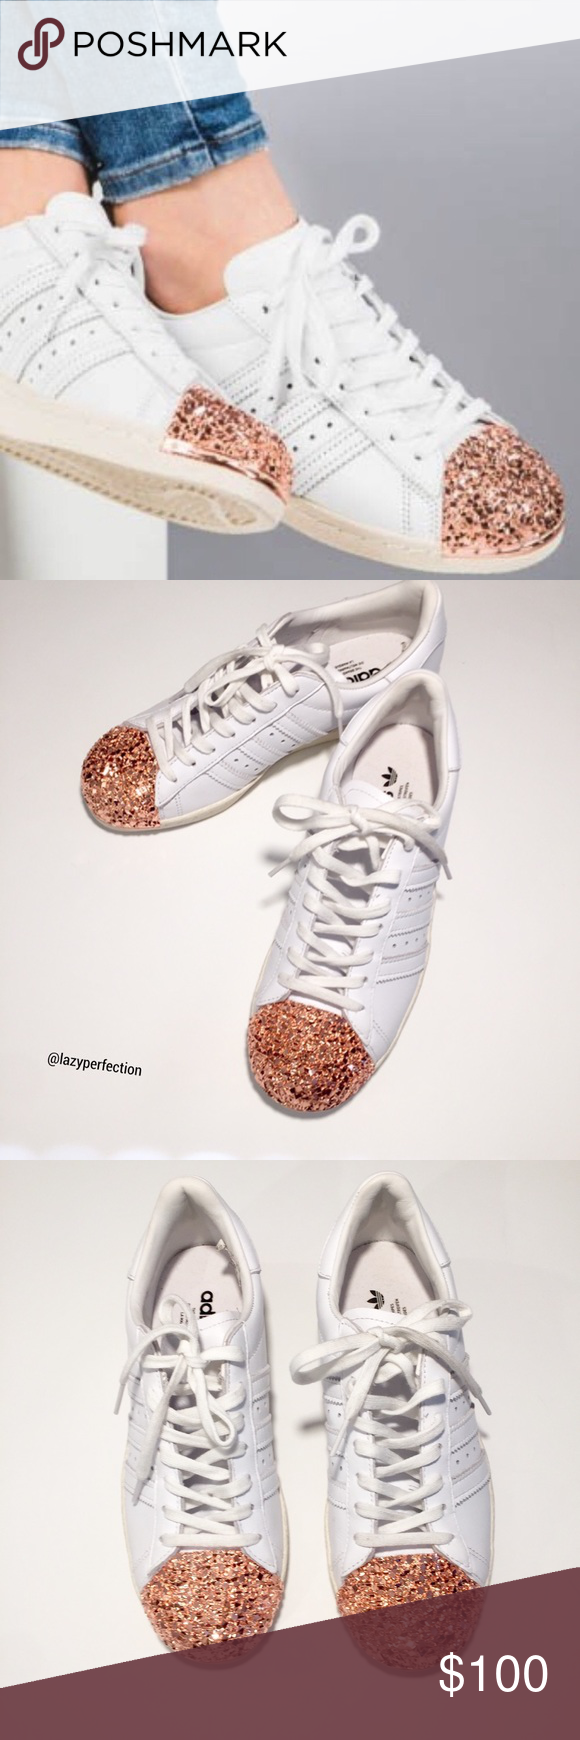 Adidas Superstar 80s Rose Gold 3D Metal Toe Cap 8 Adidas Superstar 80s  Sneaker with Rose Gold 3D Metal Toe Cap Size 8 Full Grain Leather.  Condition  NWOB. 6958fbe5c172